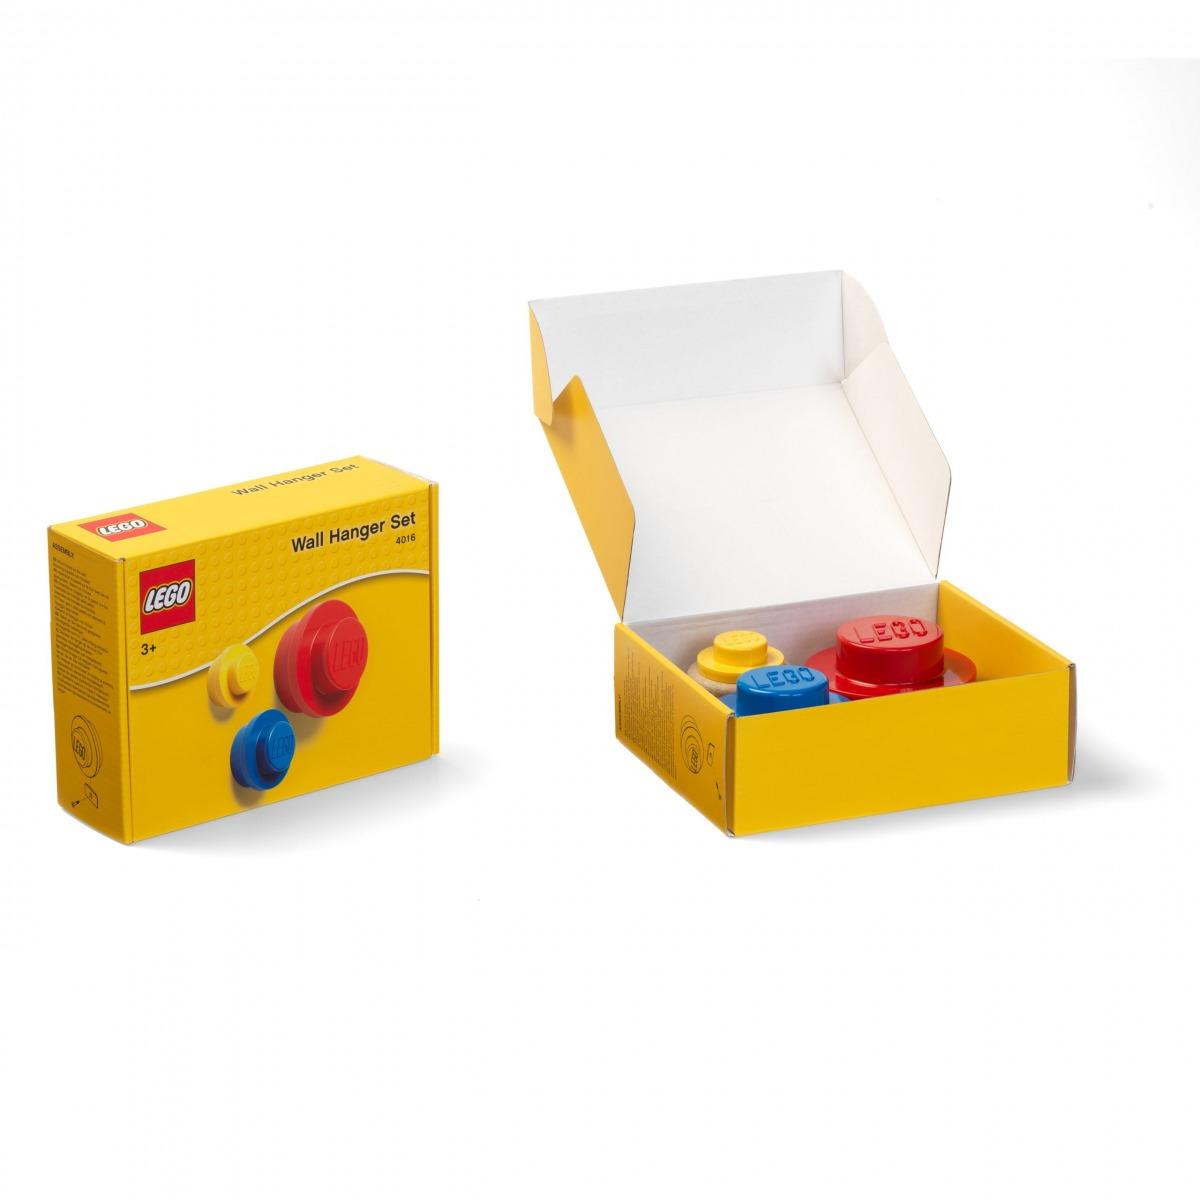 lego 5005906 vaggknoppar rod bla och gul scaled